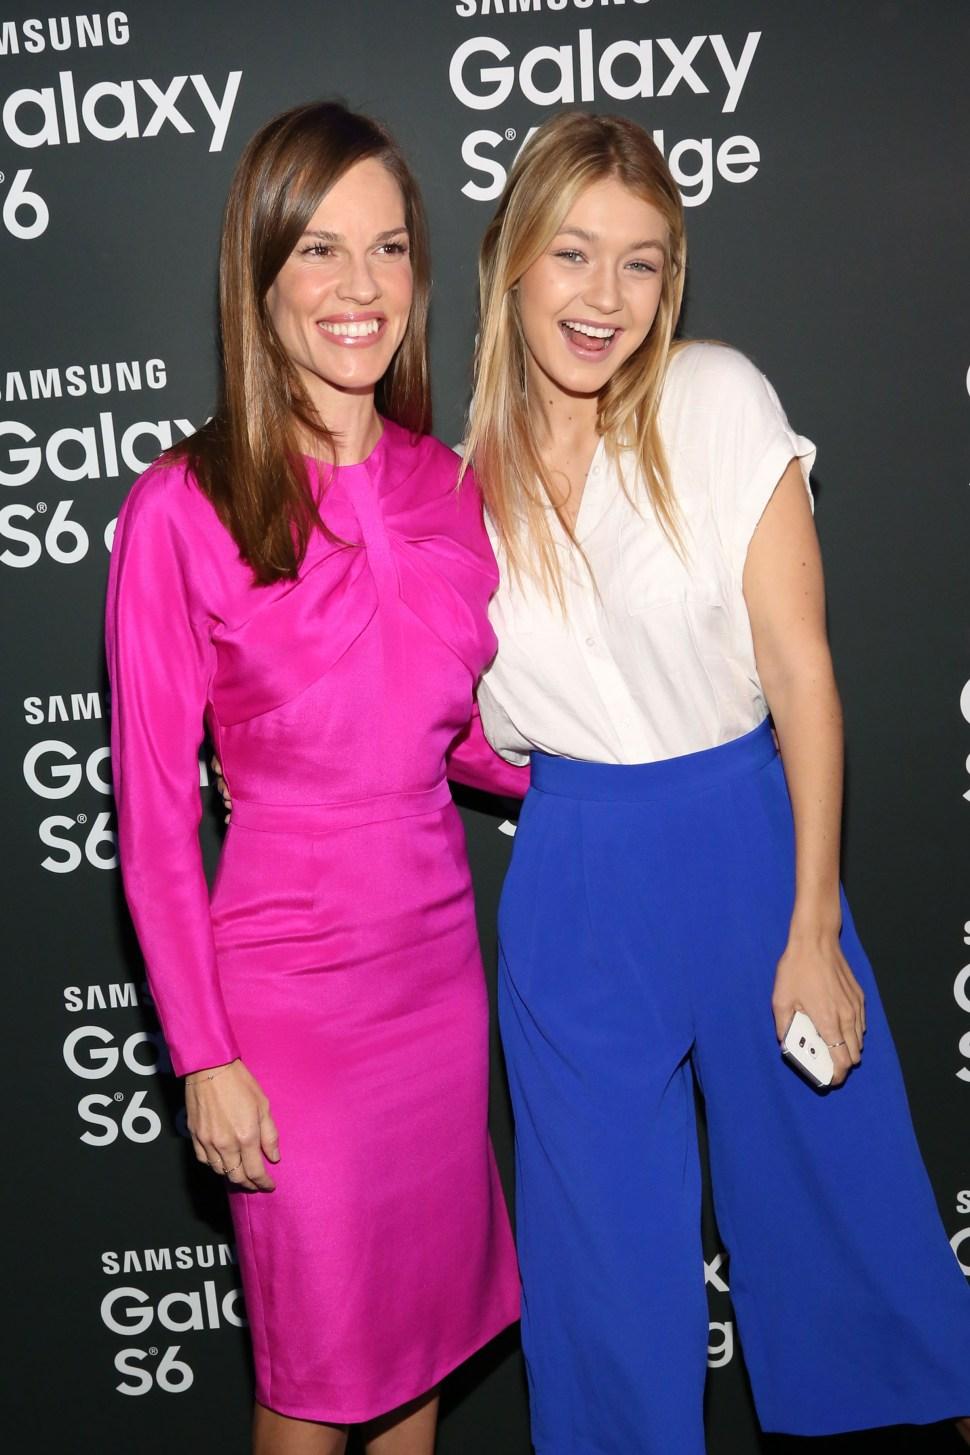 Samsung Celebrates Launch of Galaxy S 6 & Galaxy S 6 Edge in NYC